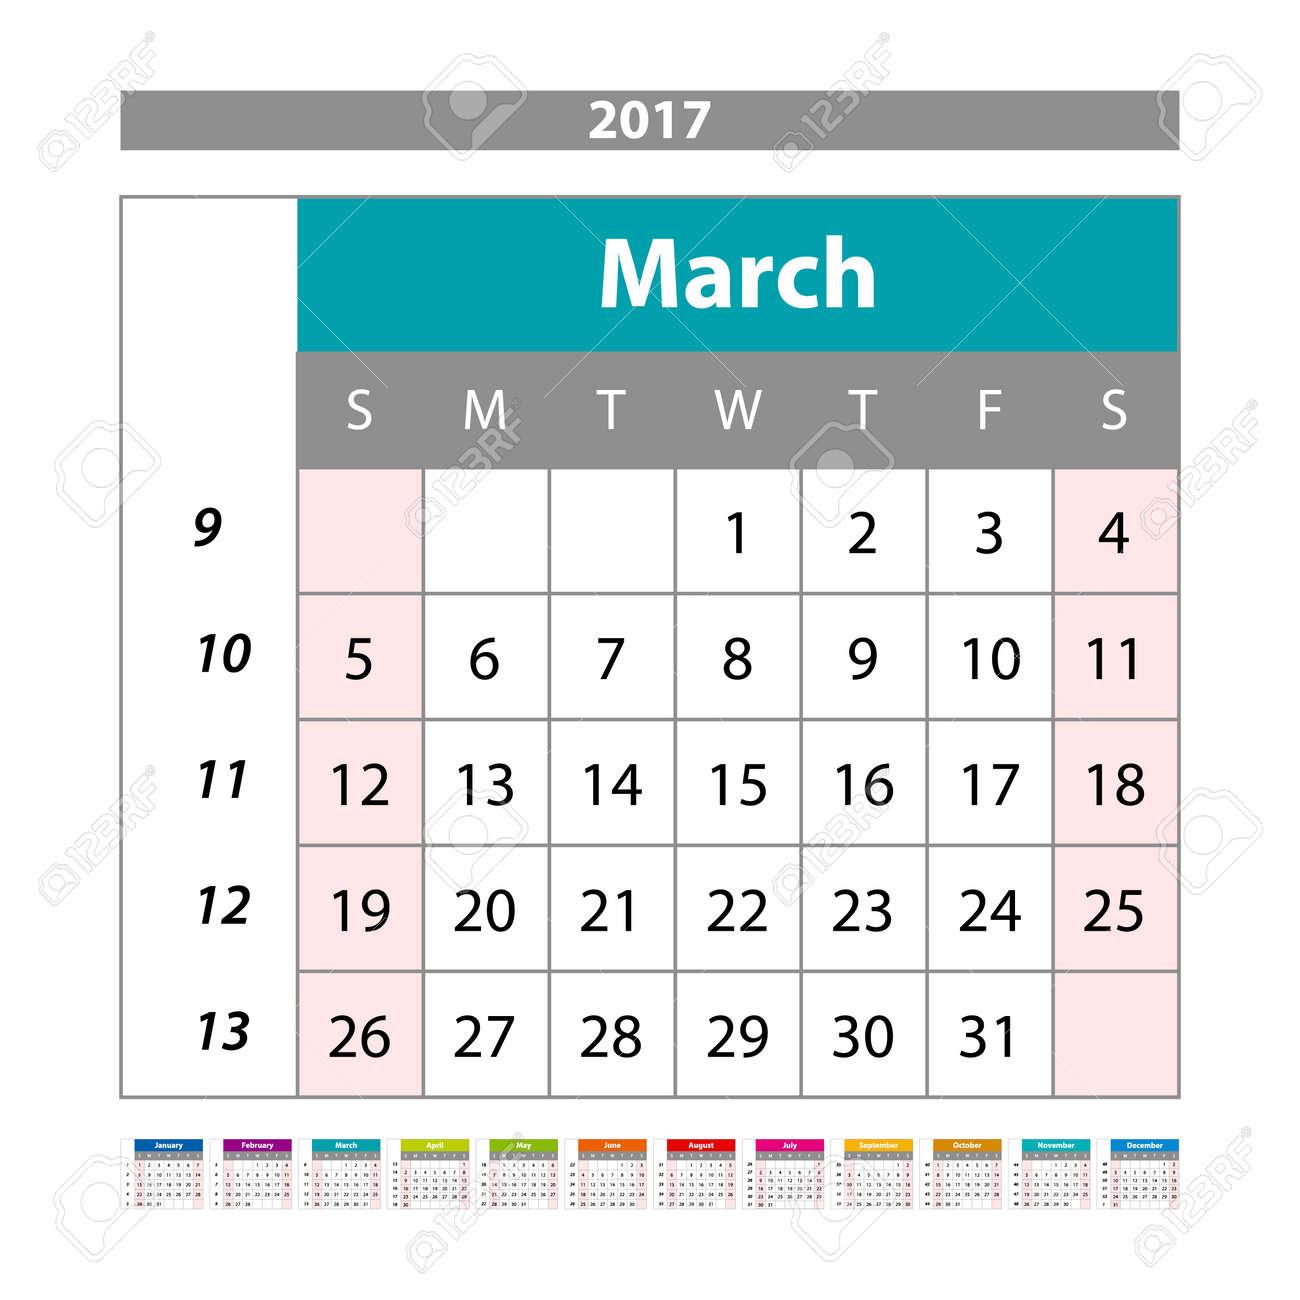 simple digital calendar for march 2017 vector printable calendar monthly scheduler week starts